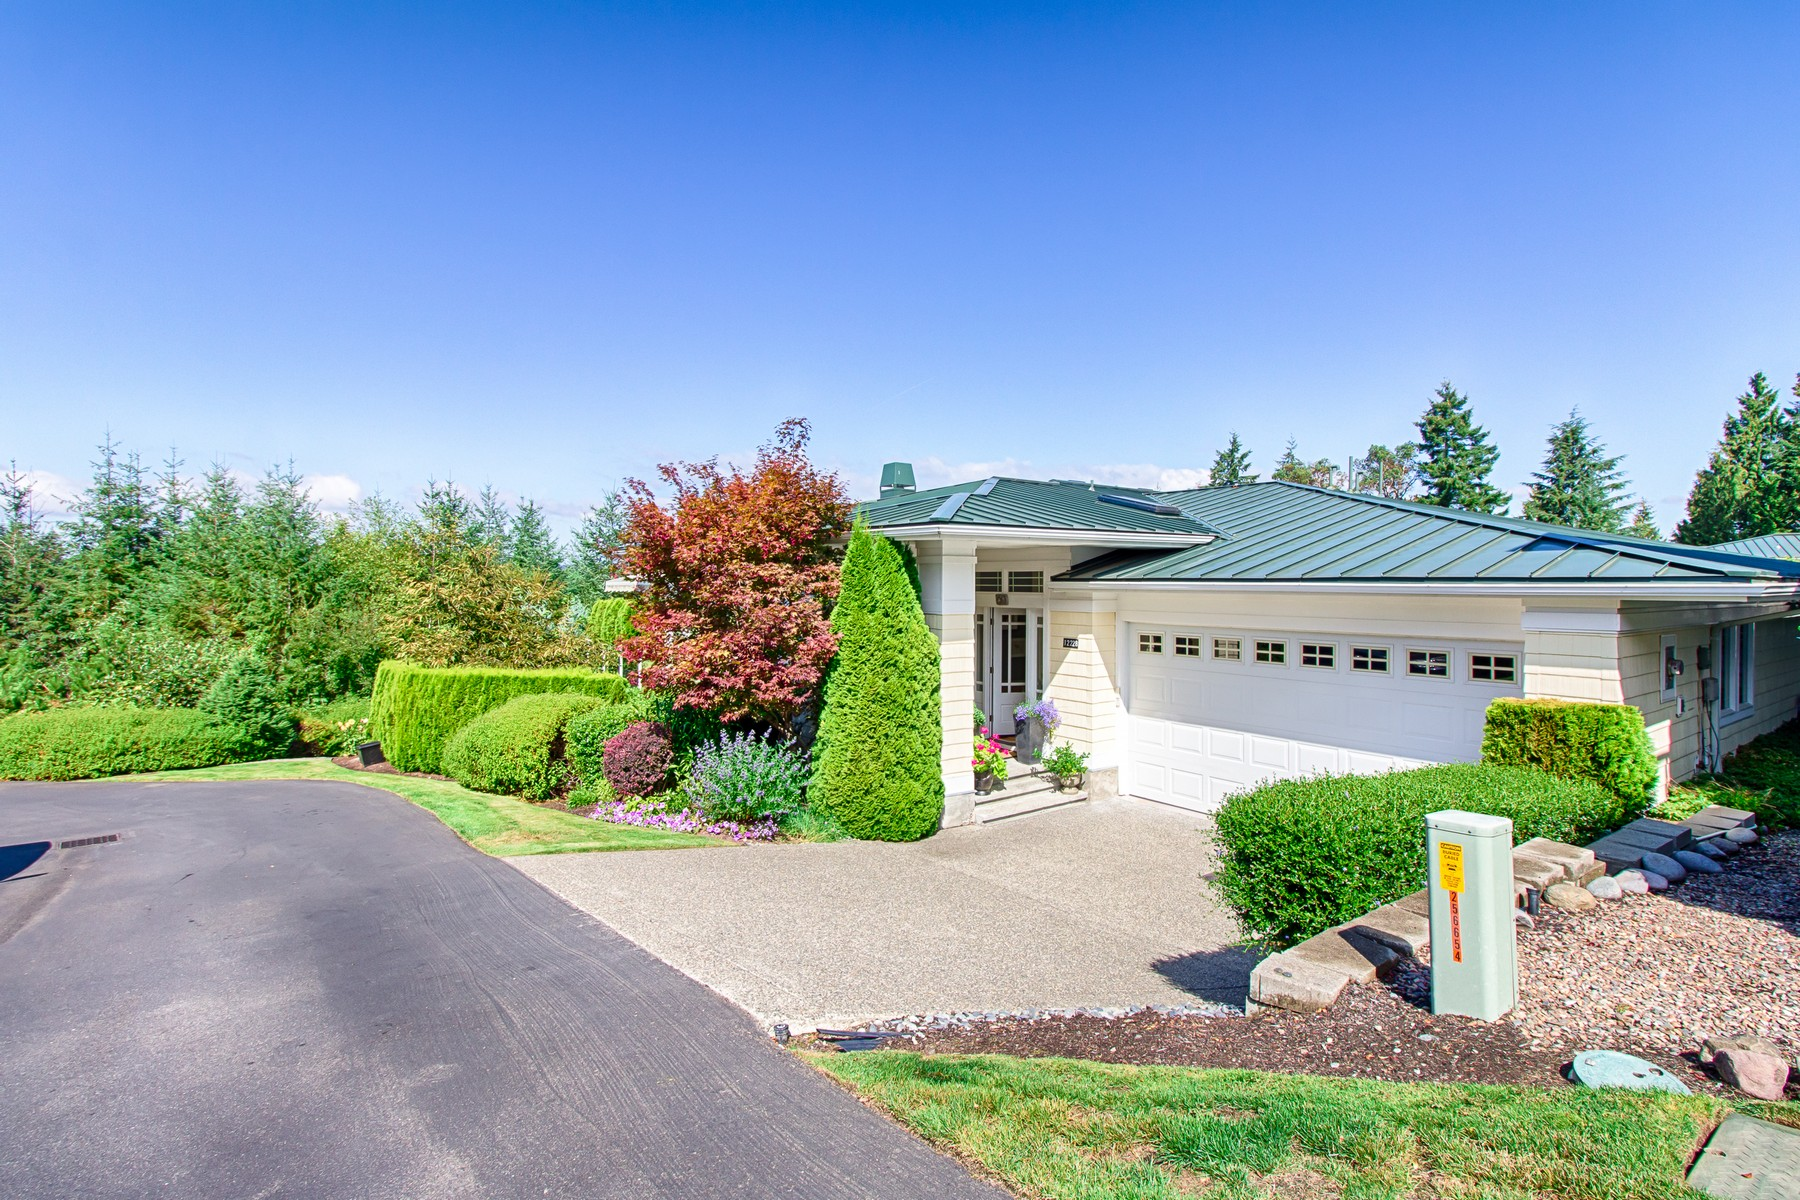 Single Family Home for Sale at Fabulous McCormick Ridge Condo 12228 59th Ave NW Unit 19 Gig Harbor, Washington, 98332 United States